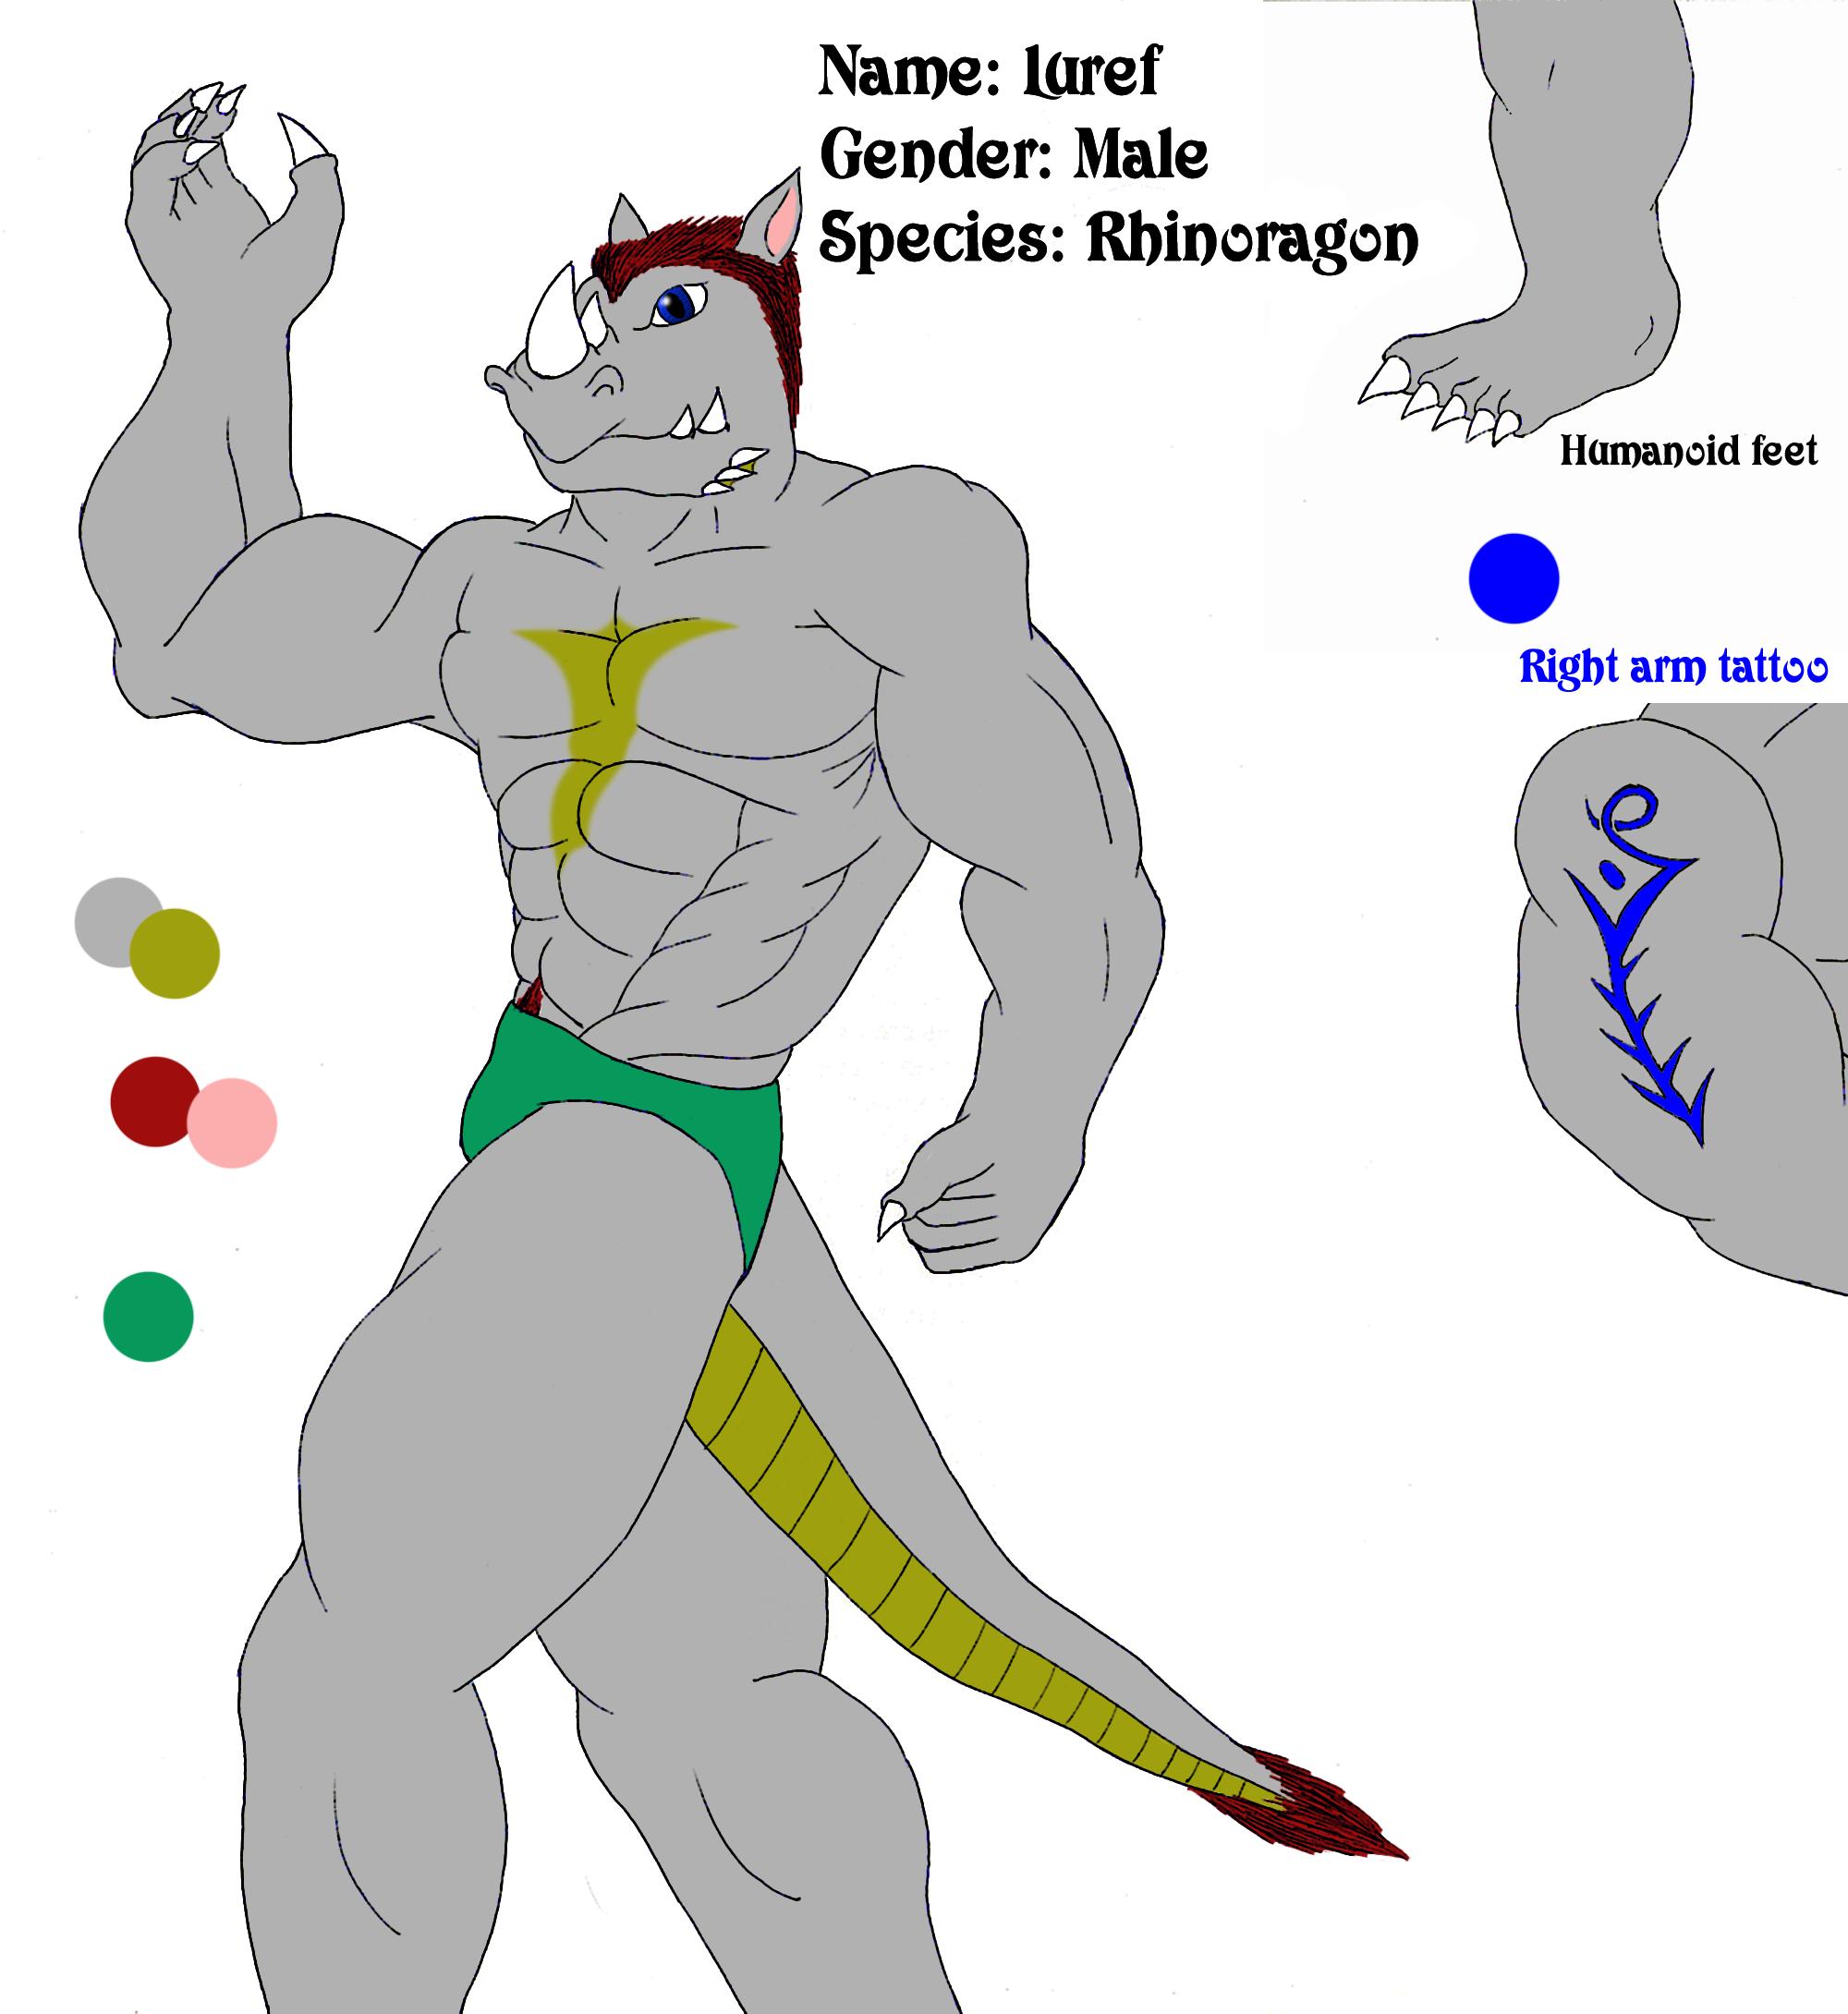 Character Sheet - Luref